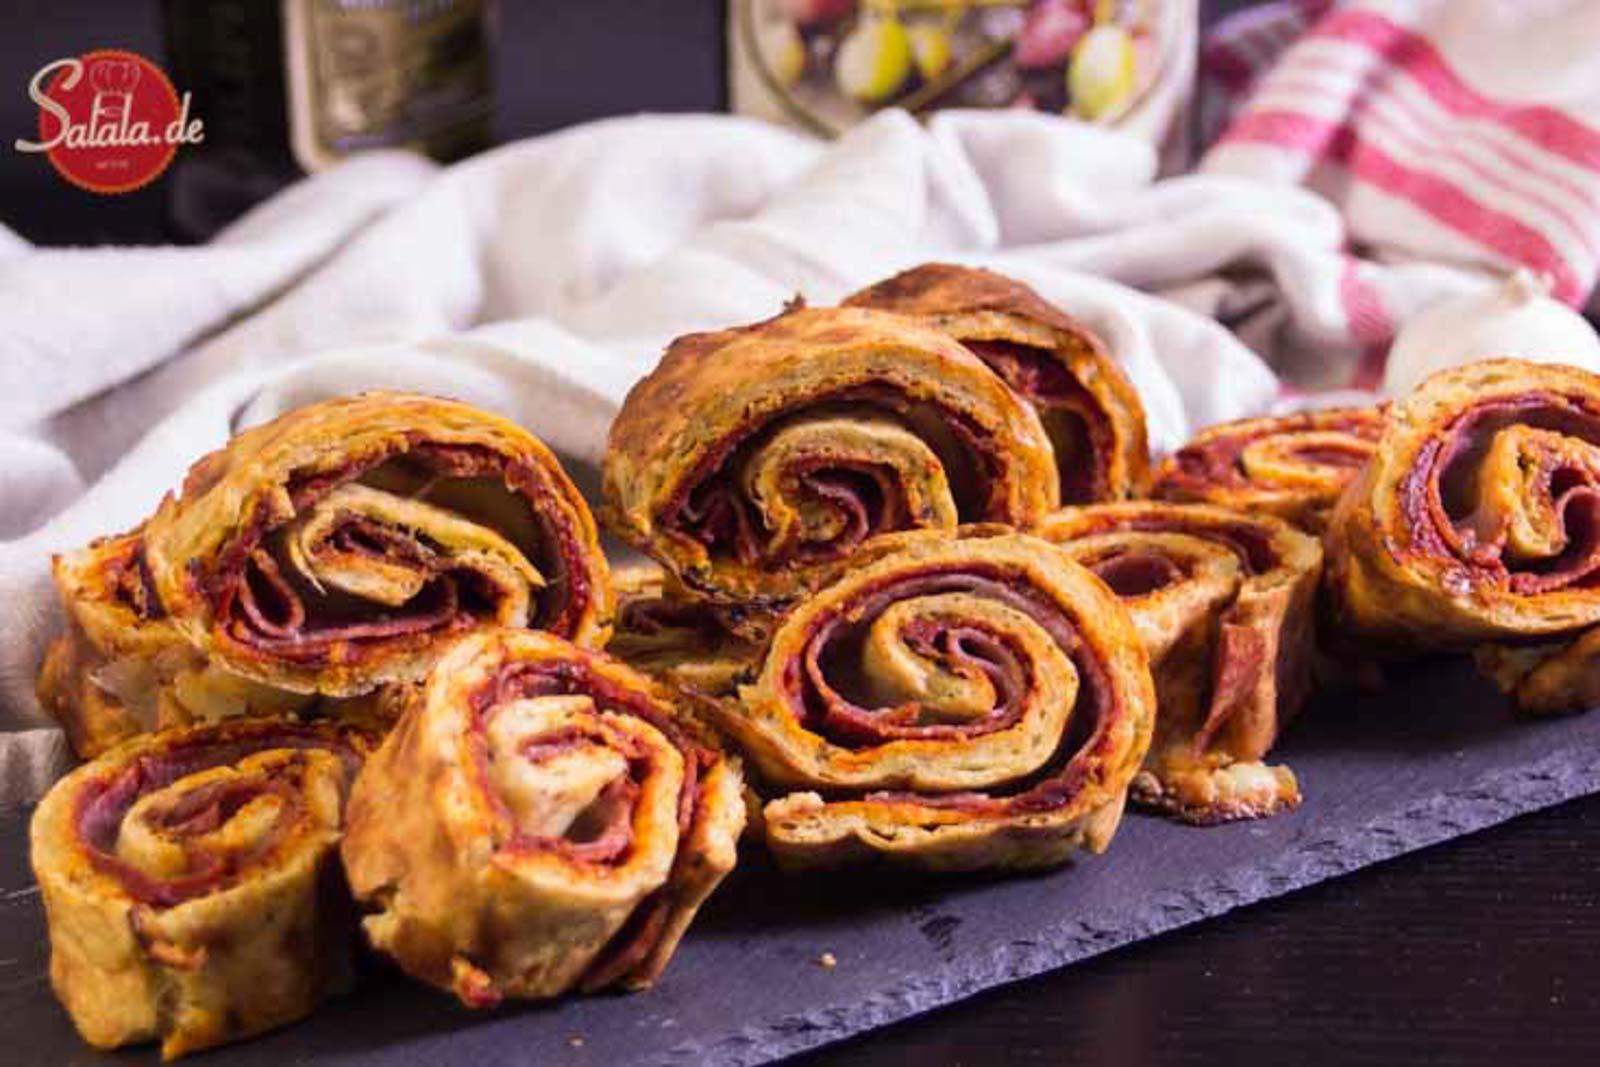 Pizza Röllchen Pizza Rolls low carb glutenfrei salala.de